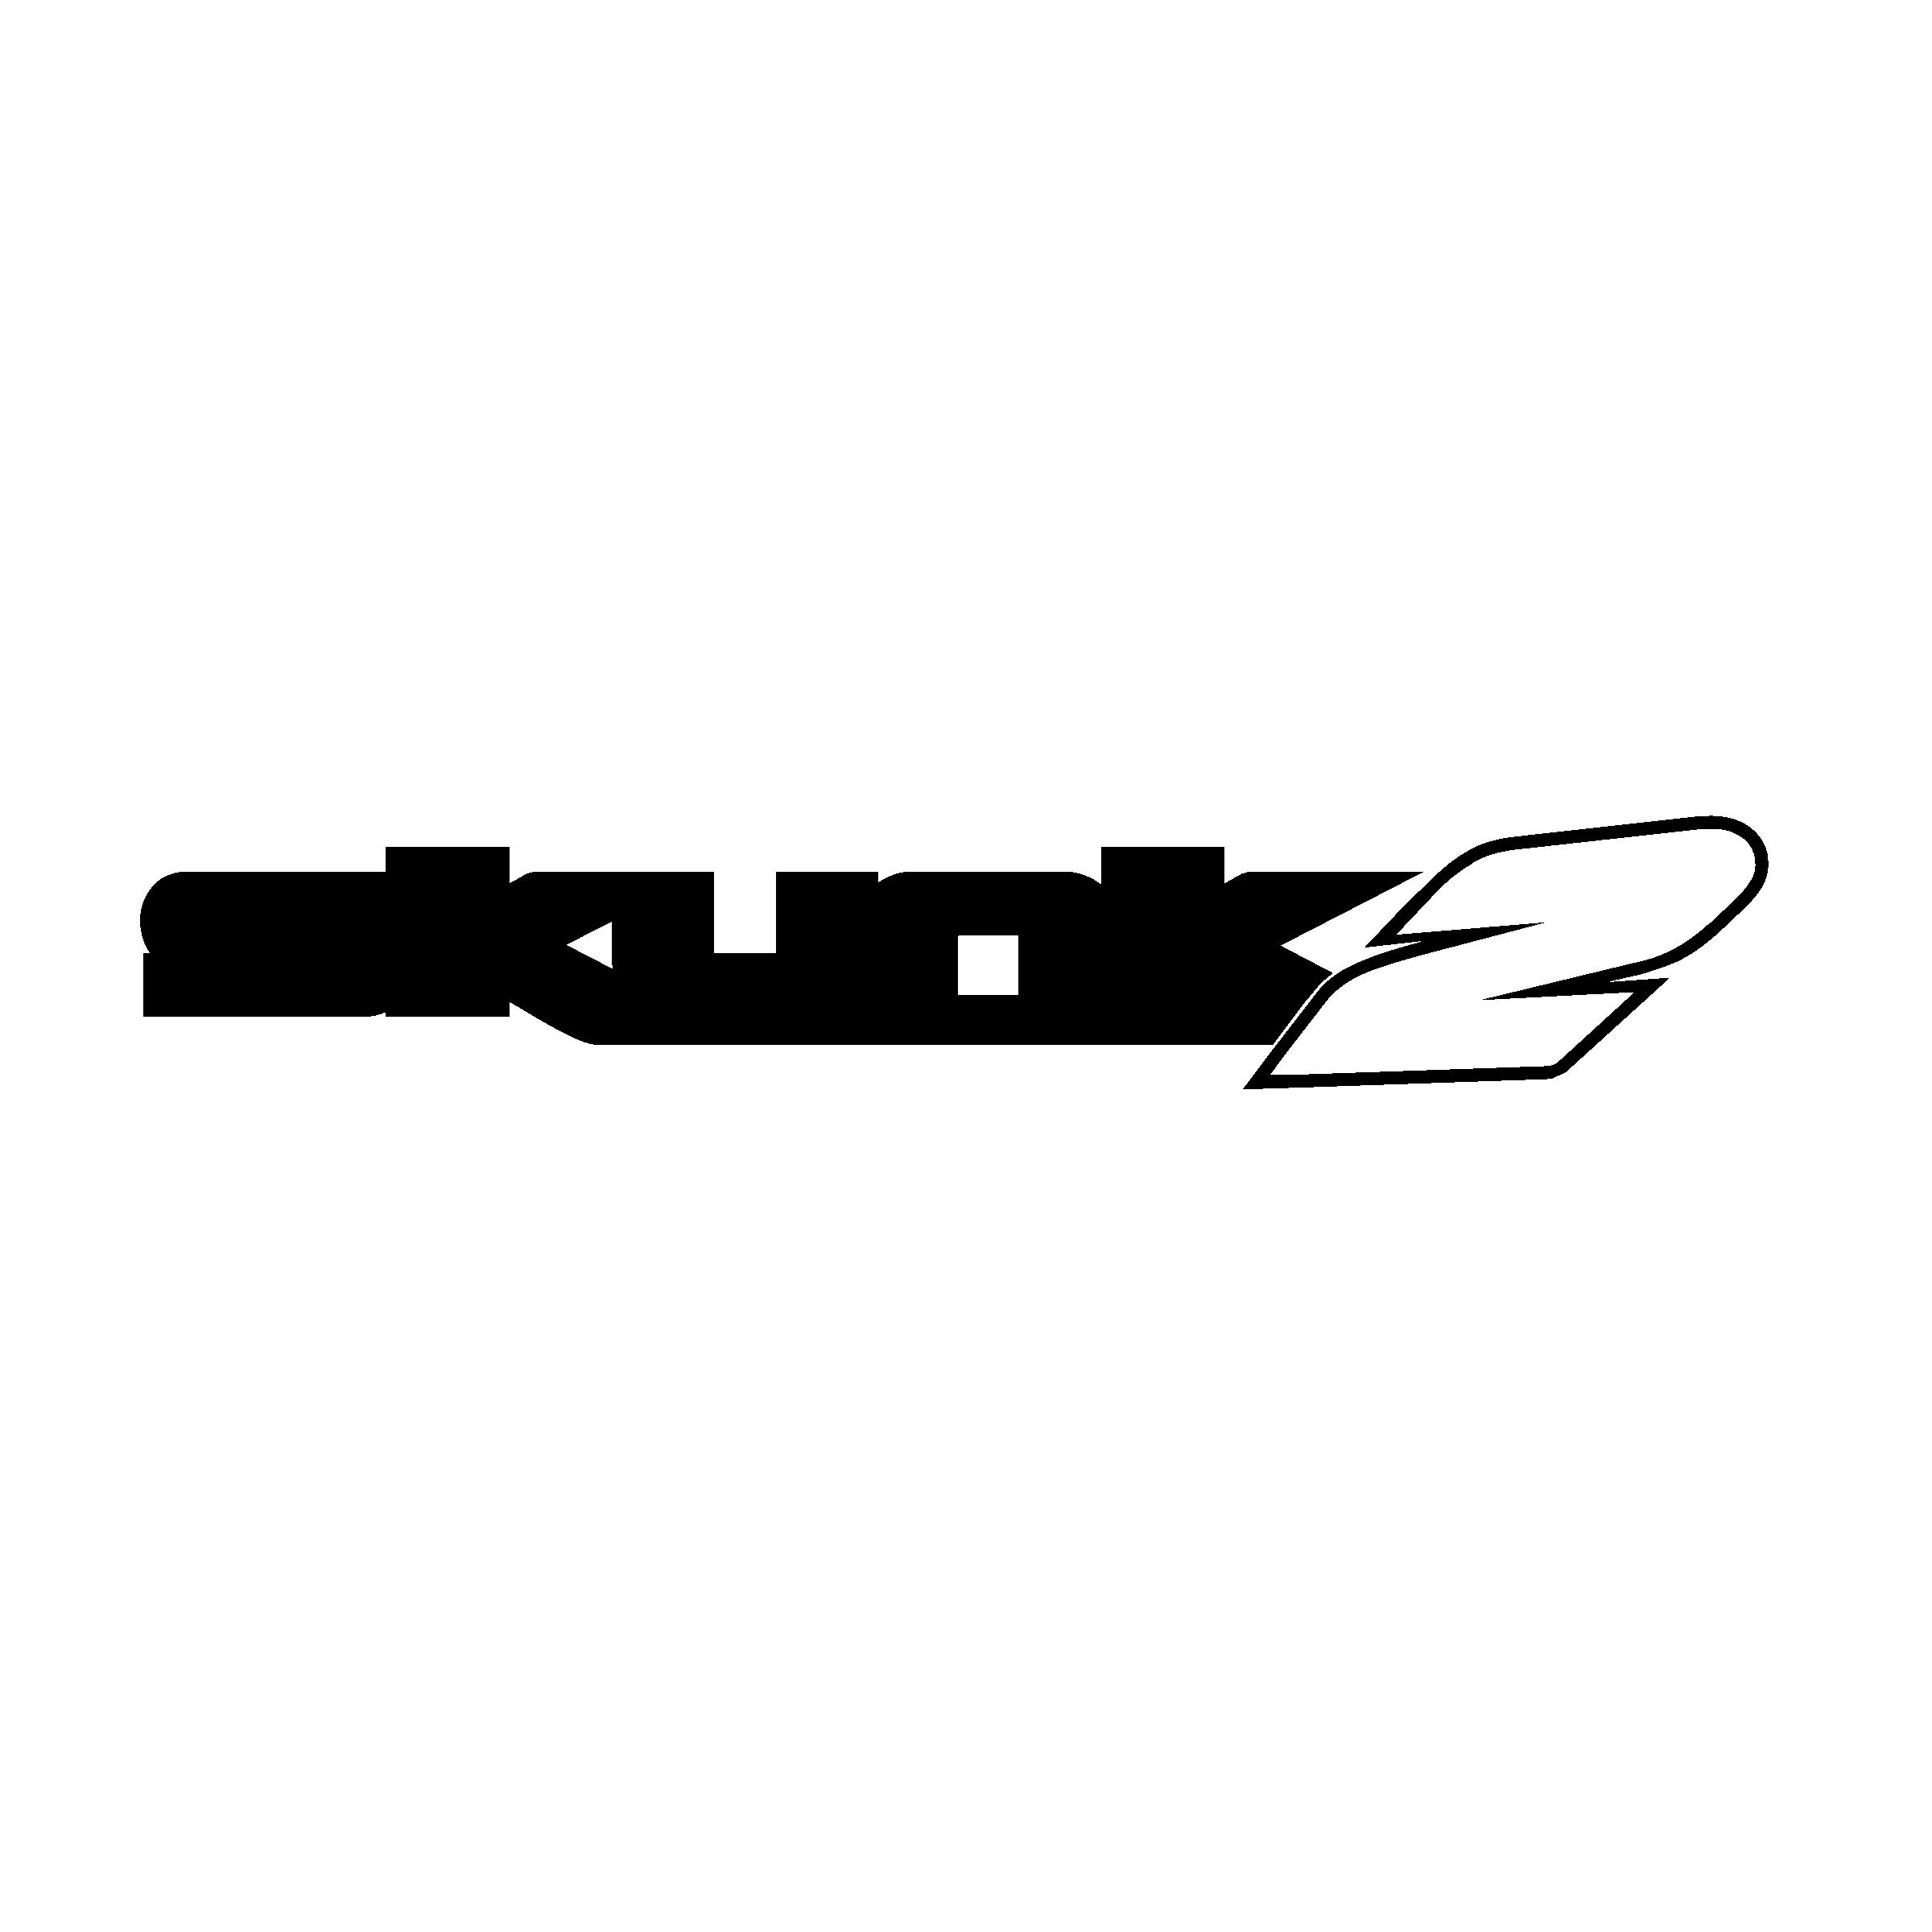 Skunk2 Racing Logo PNG Transparent & SVG Vector - Freebie ...